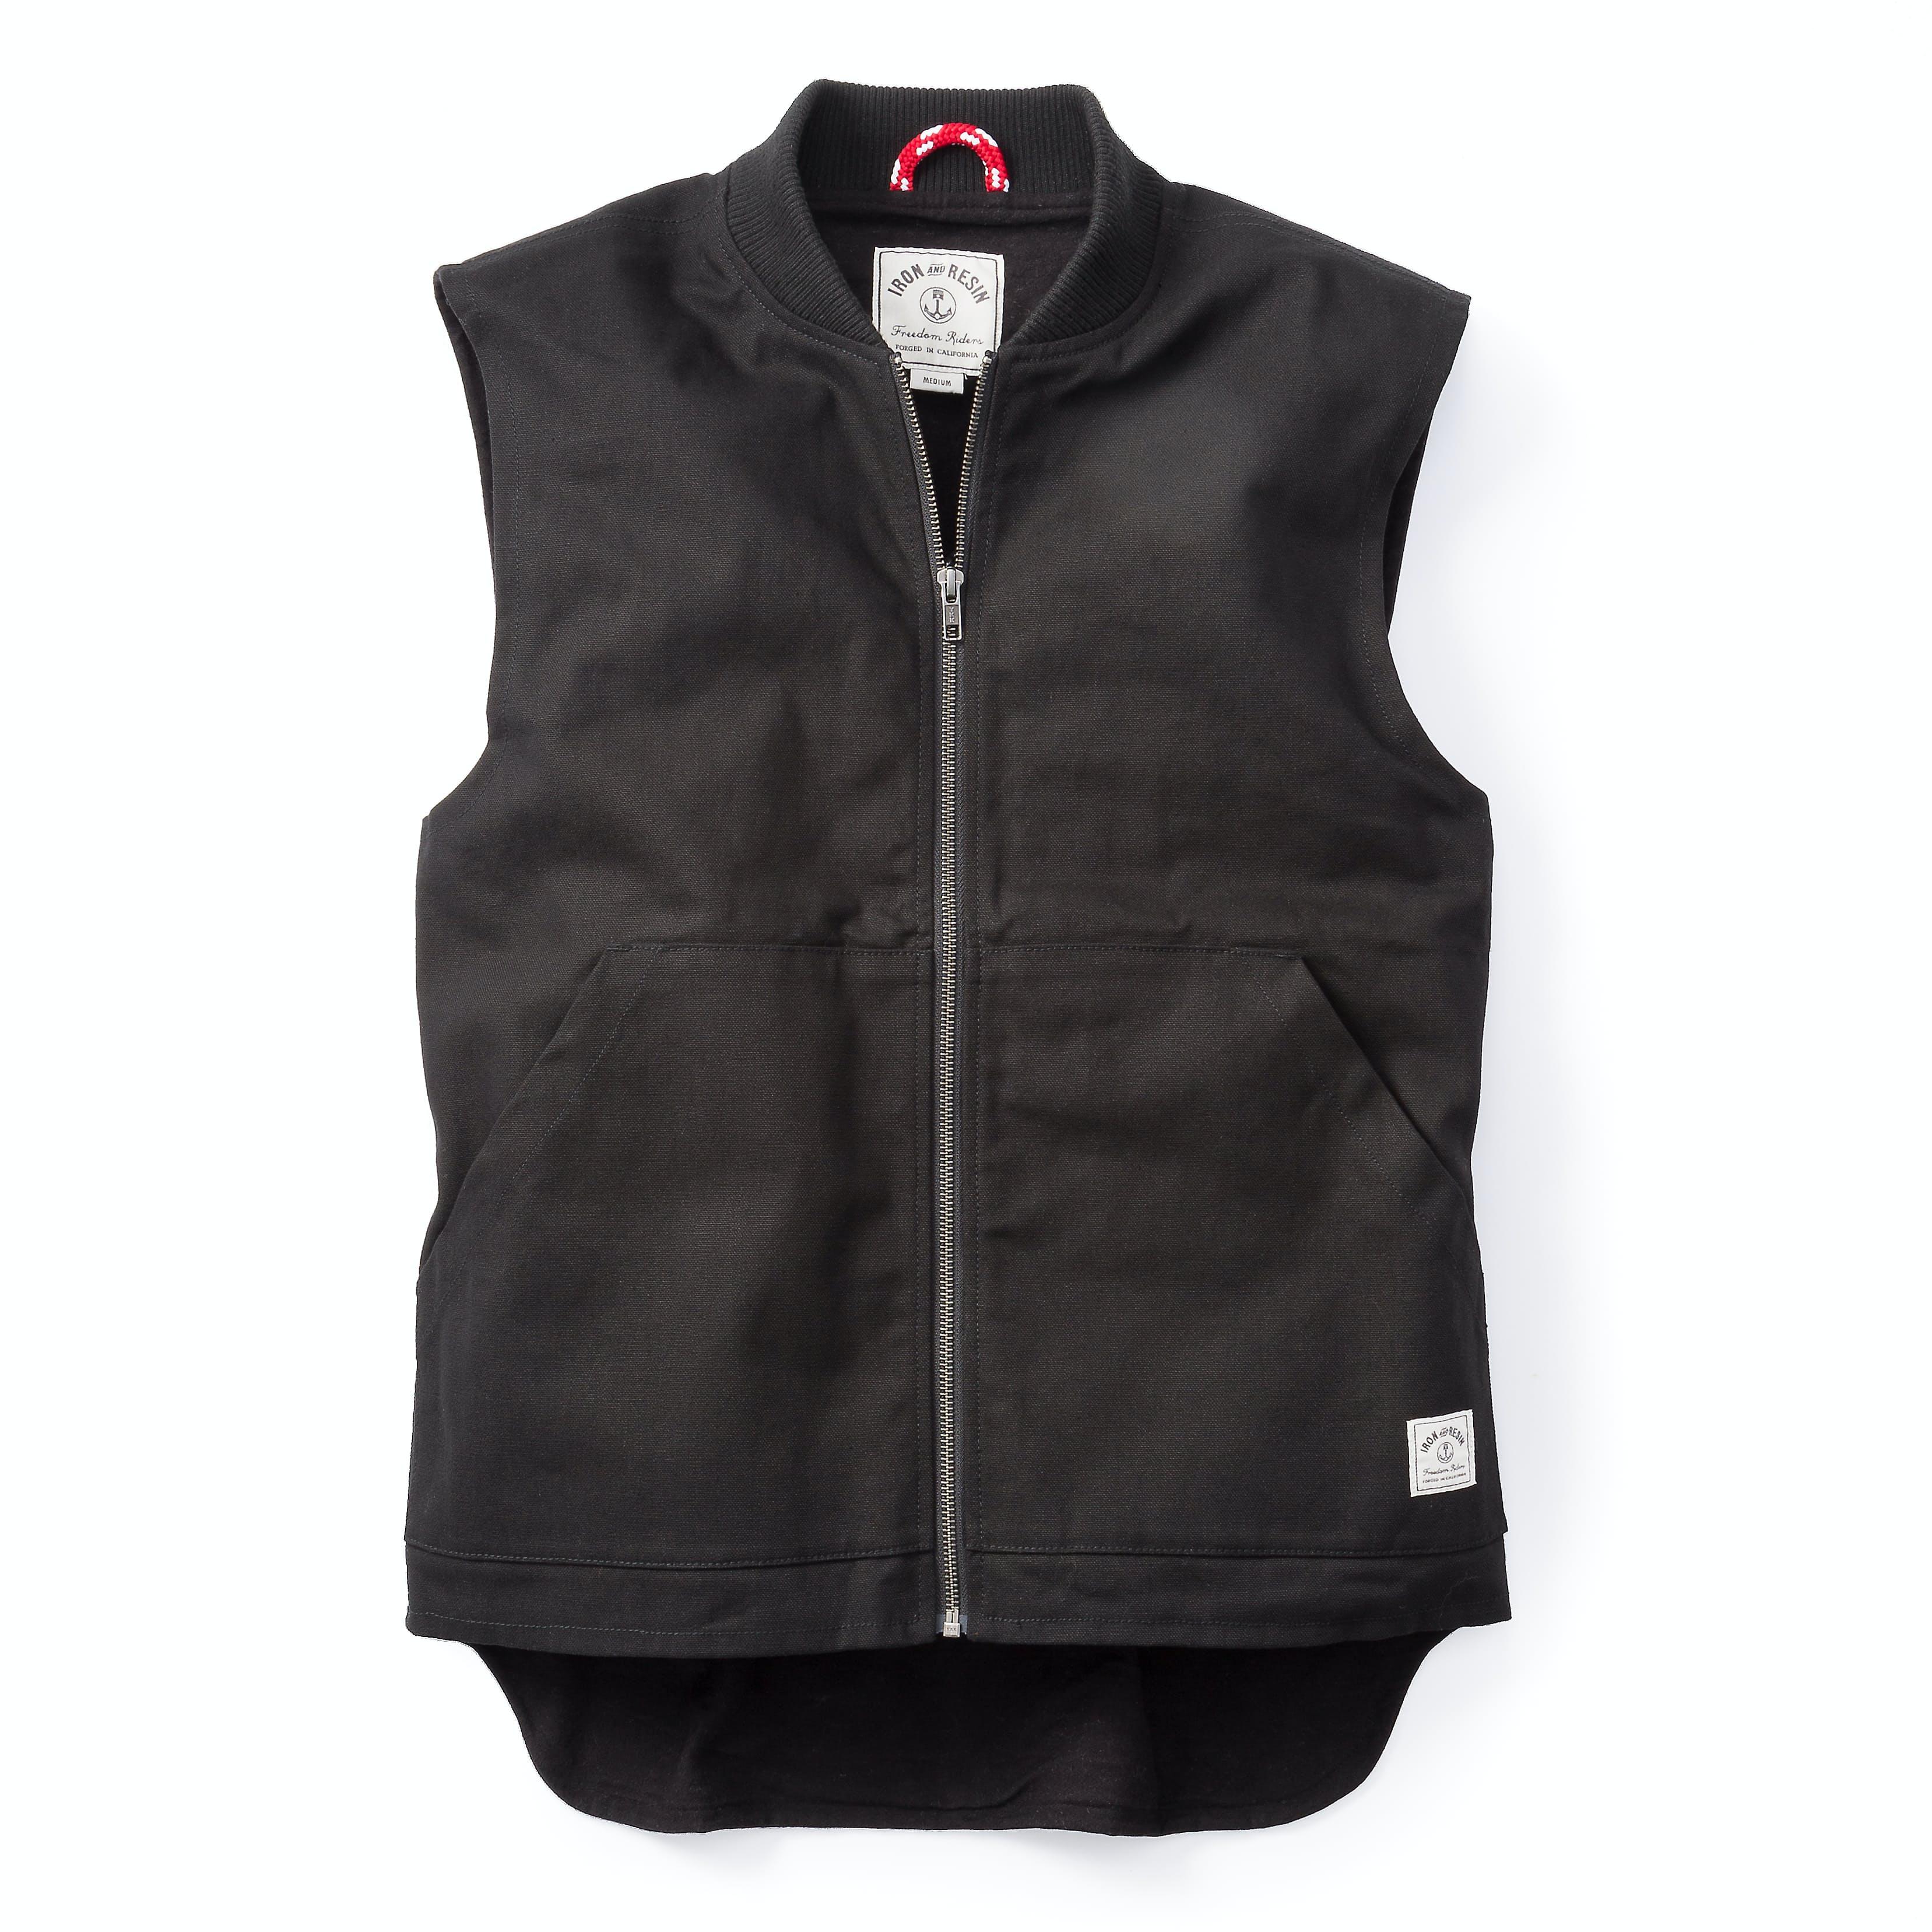 Gqanuakd6n iron and resin highway vest 0 original